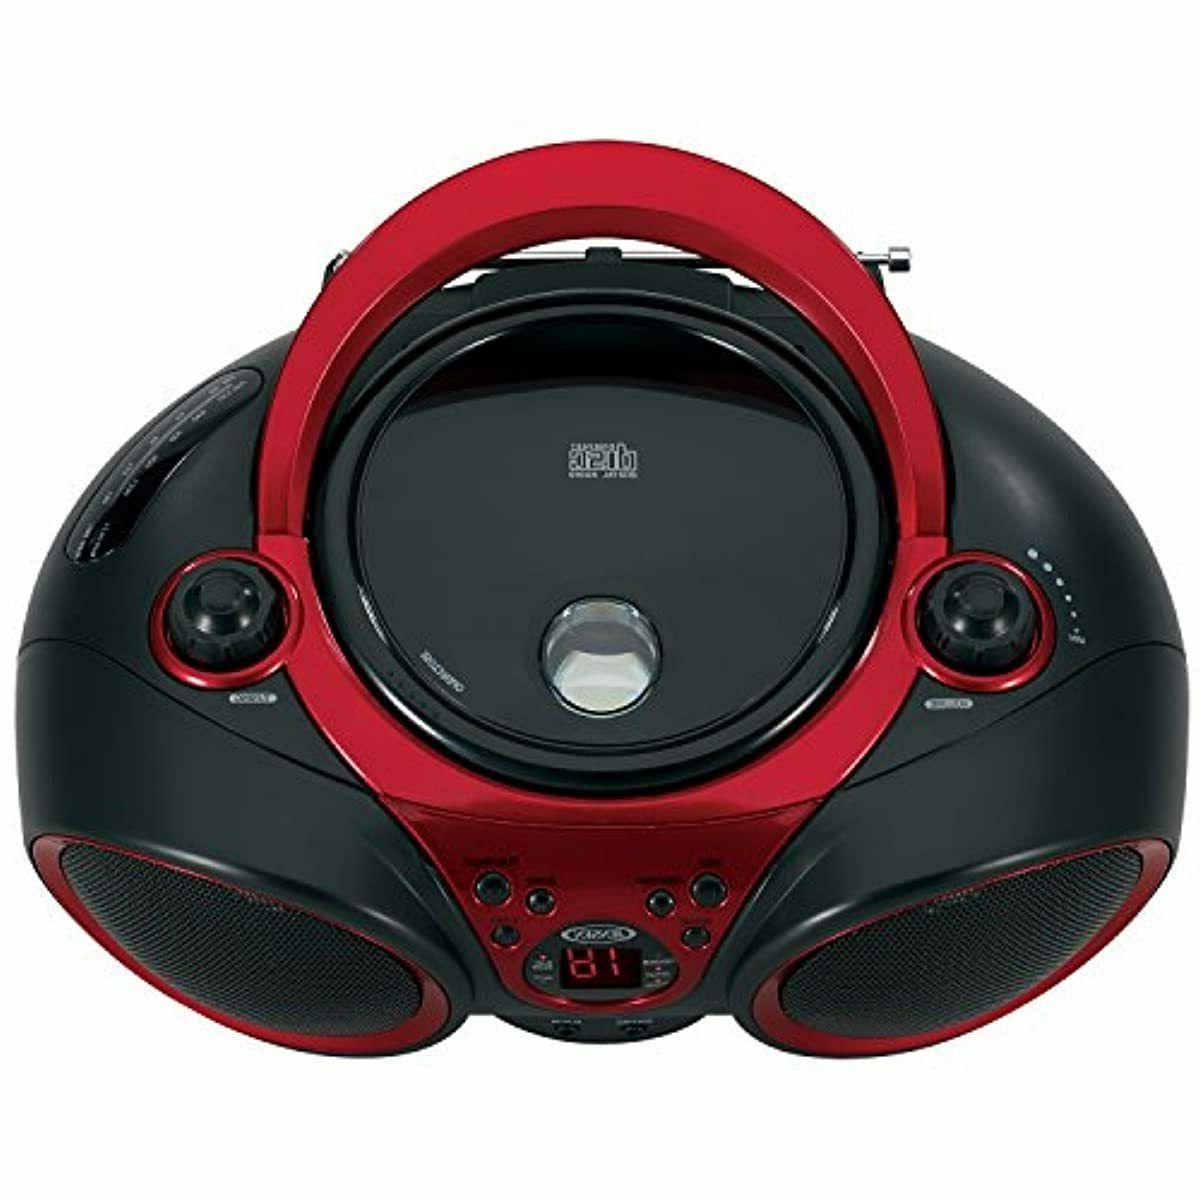 JENSEN CD-490 Portable CD Radio Red an